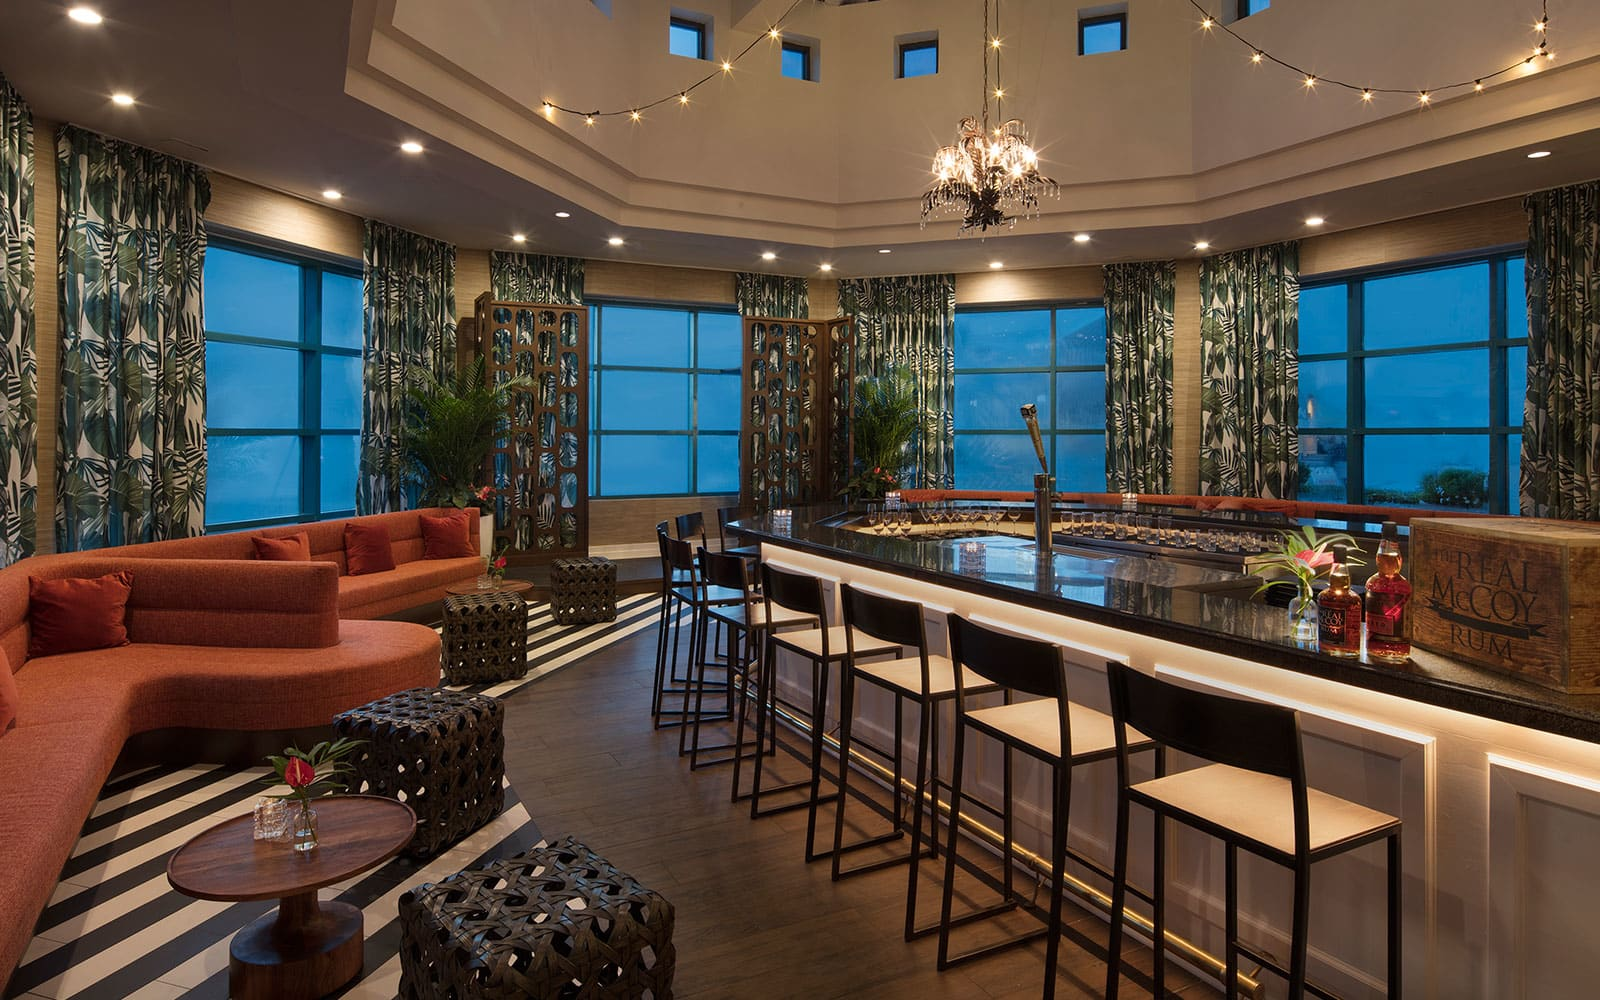 McCoys Rum Room at Hilton Daytona Beach Oceanfront Resort